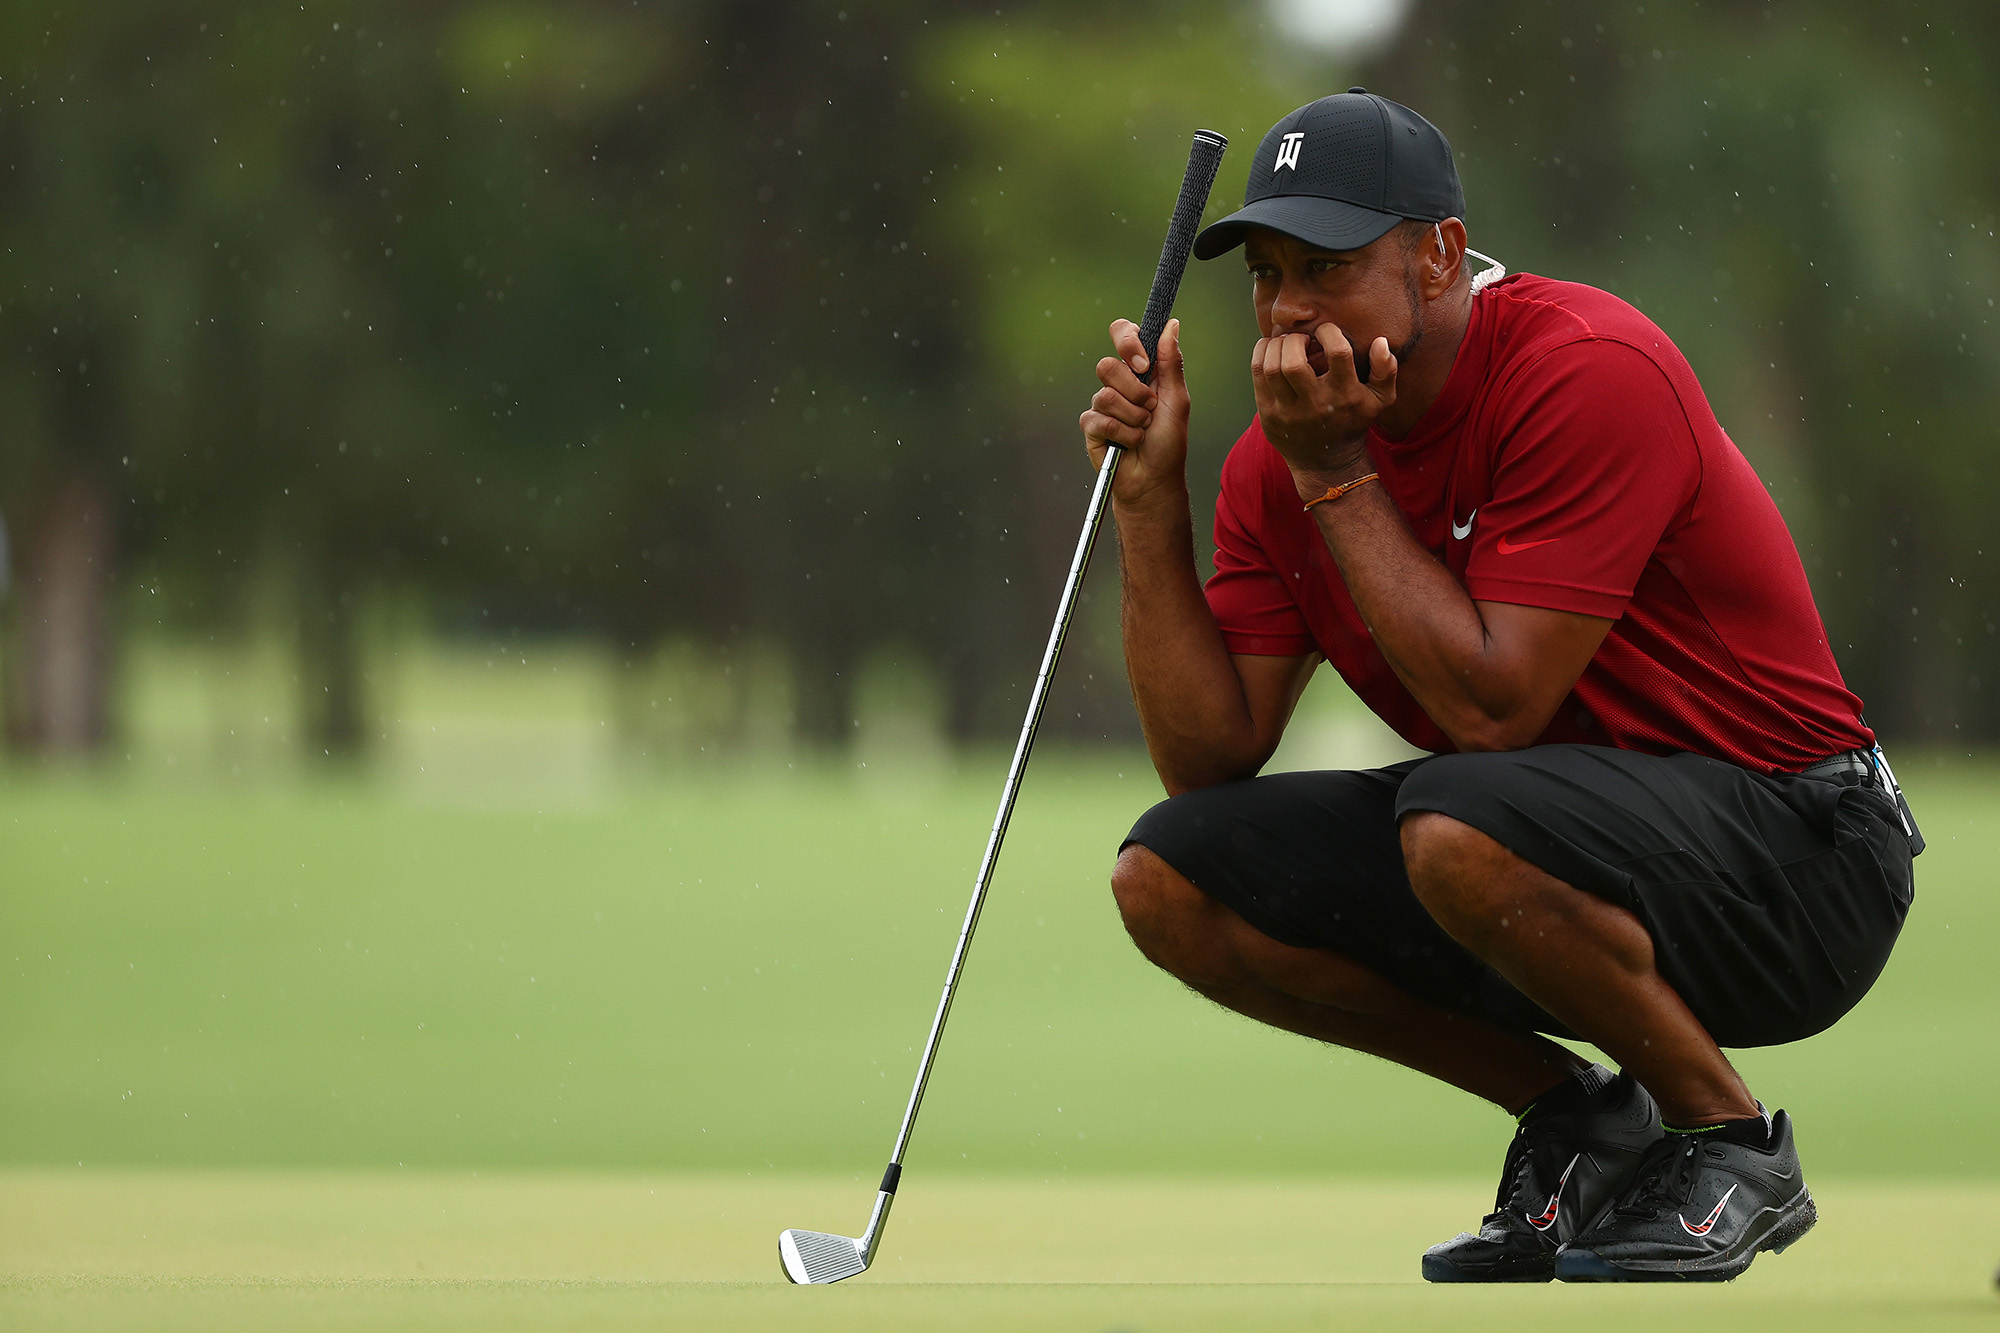 Tiger Woods Golf Future Is Biggest Enigma Of Pga Restart